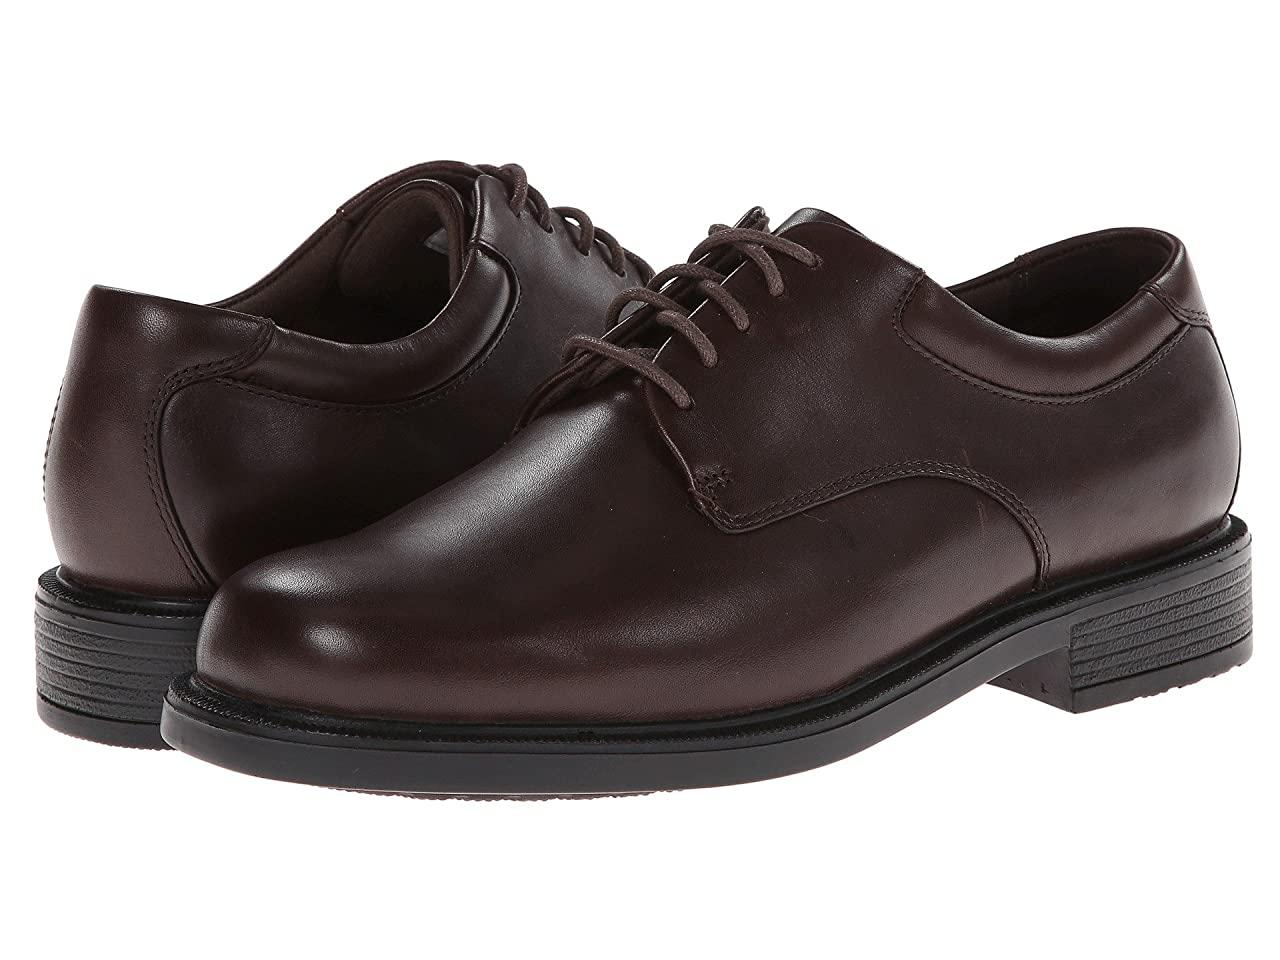 Туфли (Оригинал) Rockport Big Bucks Margin Chocolate Leather